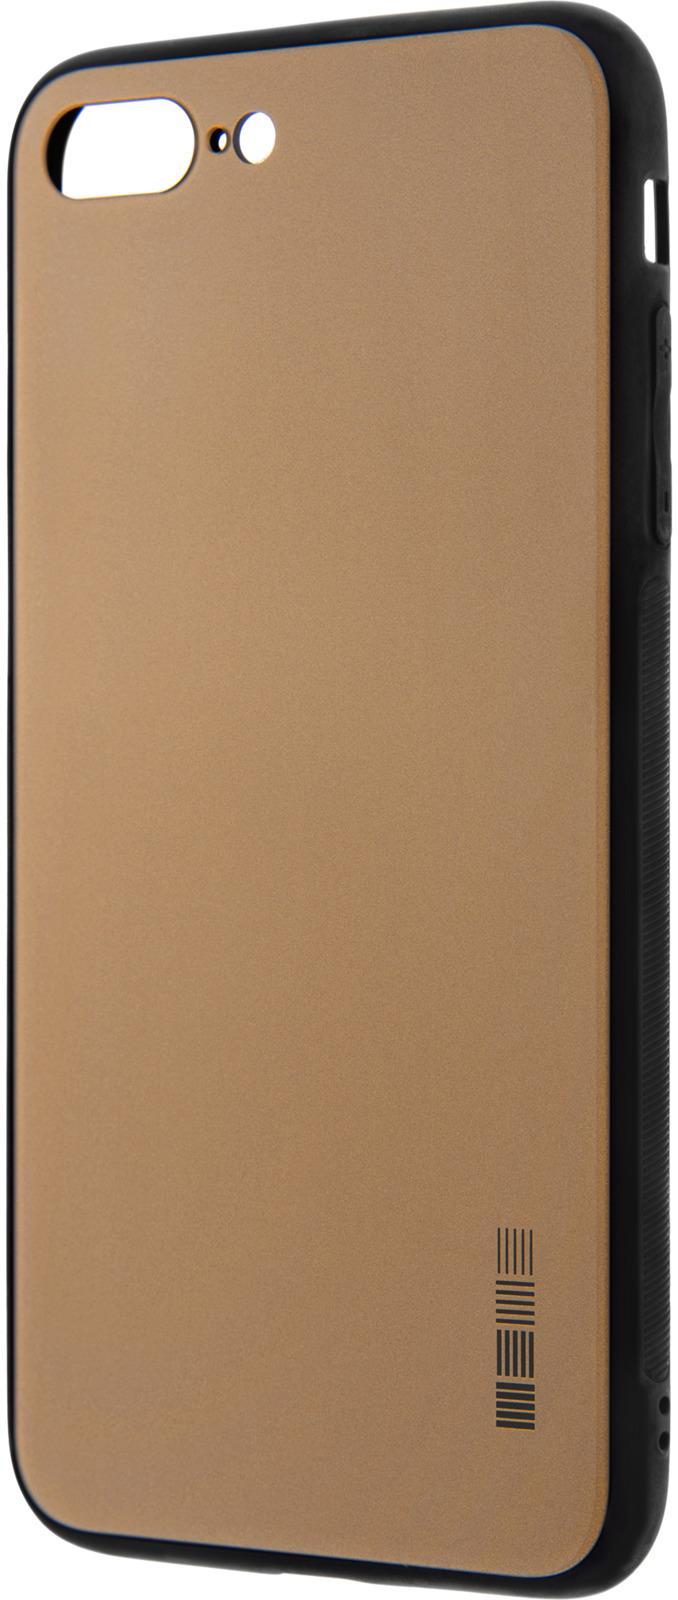 Чехол-накладка Interstep Is Glass для Apple iPhone 7/8 Plus, Gold чехол накладка interstep is bloom для apple iphone 7 8 plus turquoise